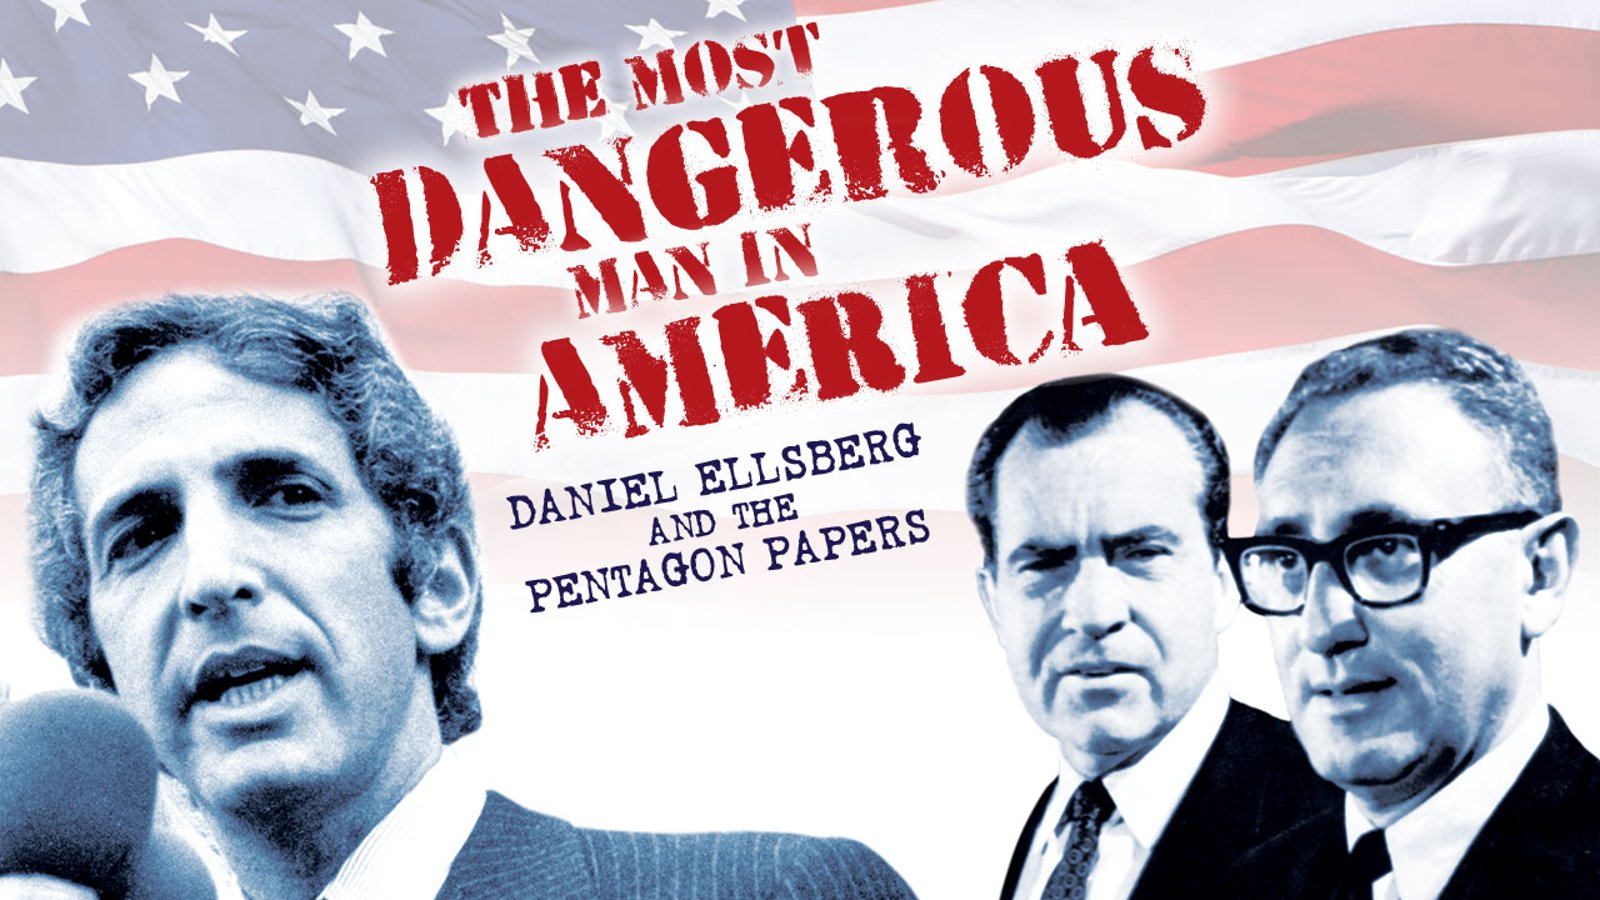 The Most Dangerous Man in America - Daniel Ellsberg and the Pentagon Papers